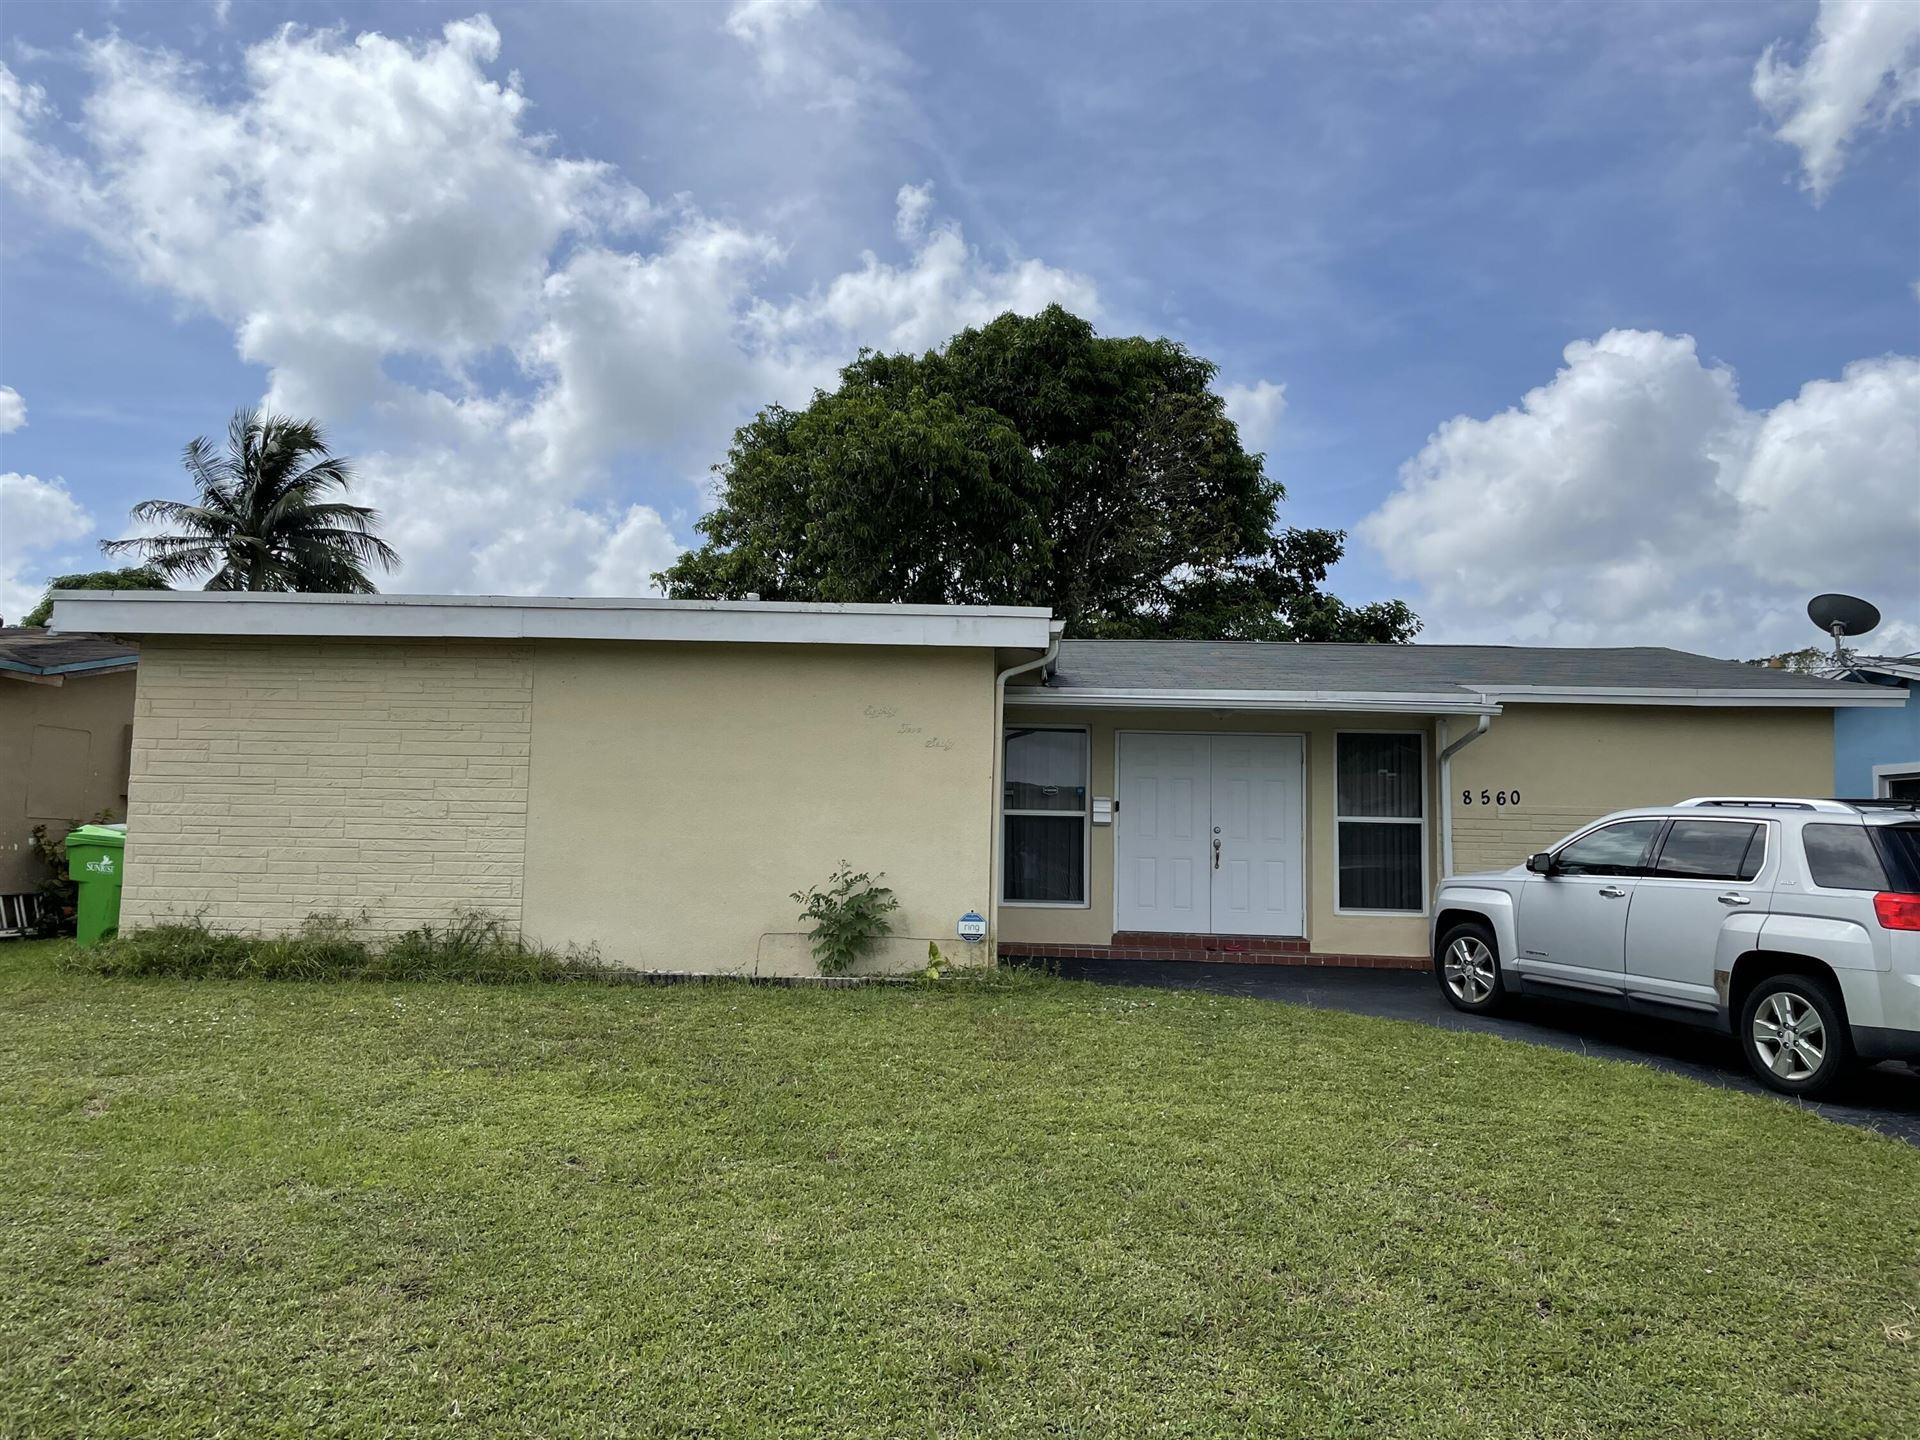 8560 NW 20th Court, Sunrise, FL 33322 - MLS#: RX-10742199